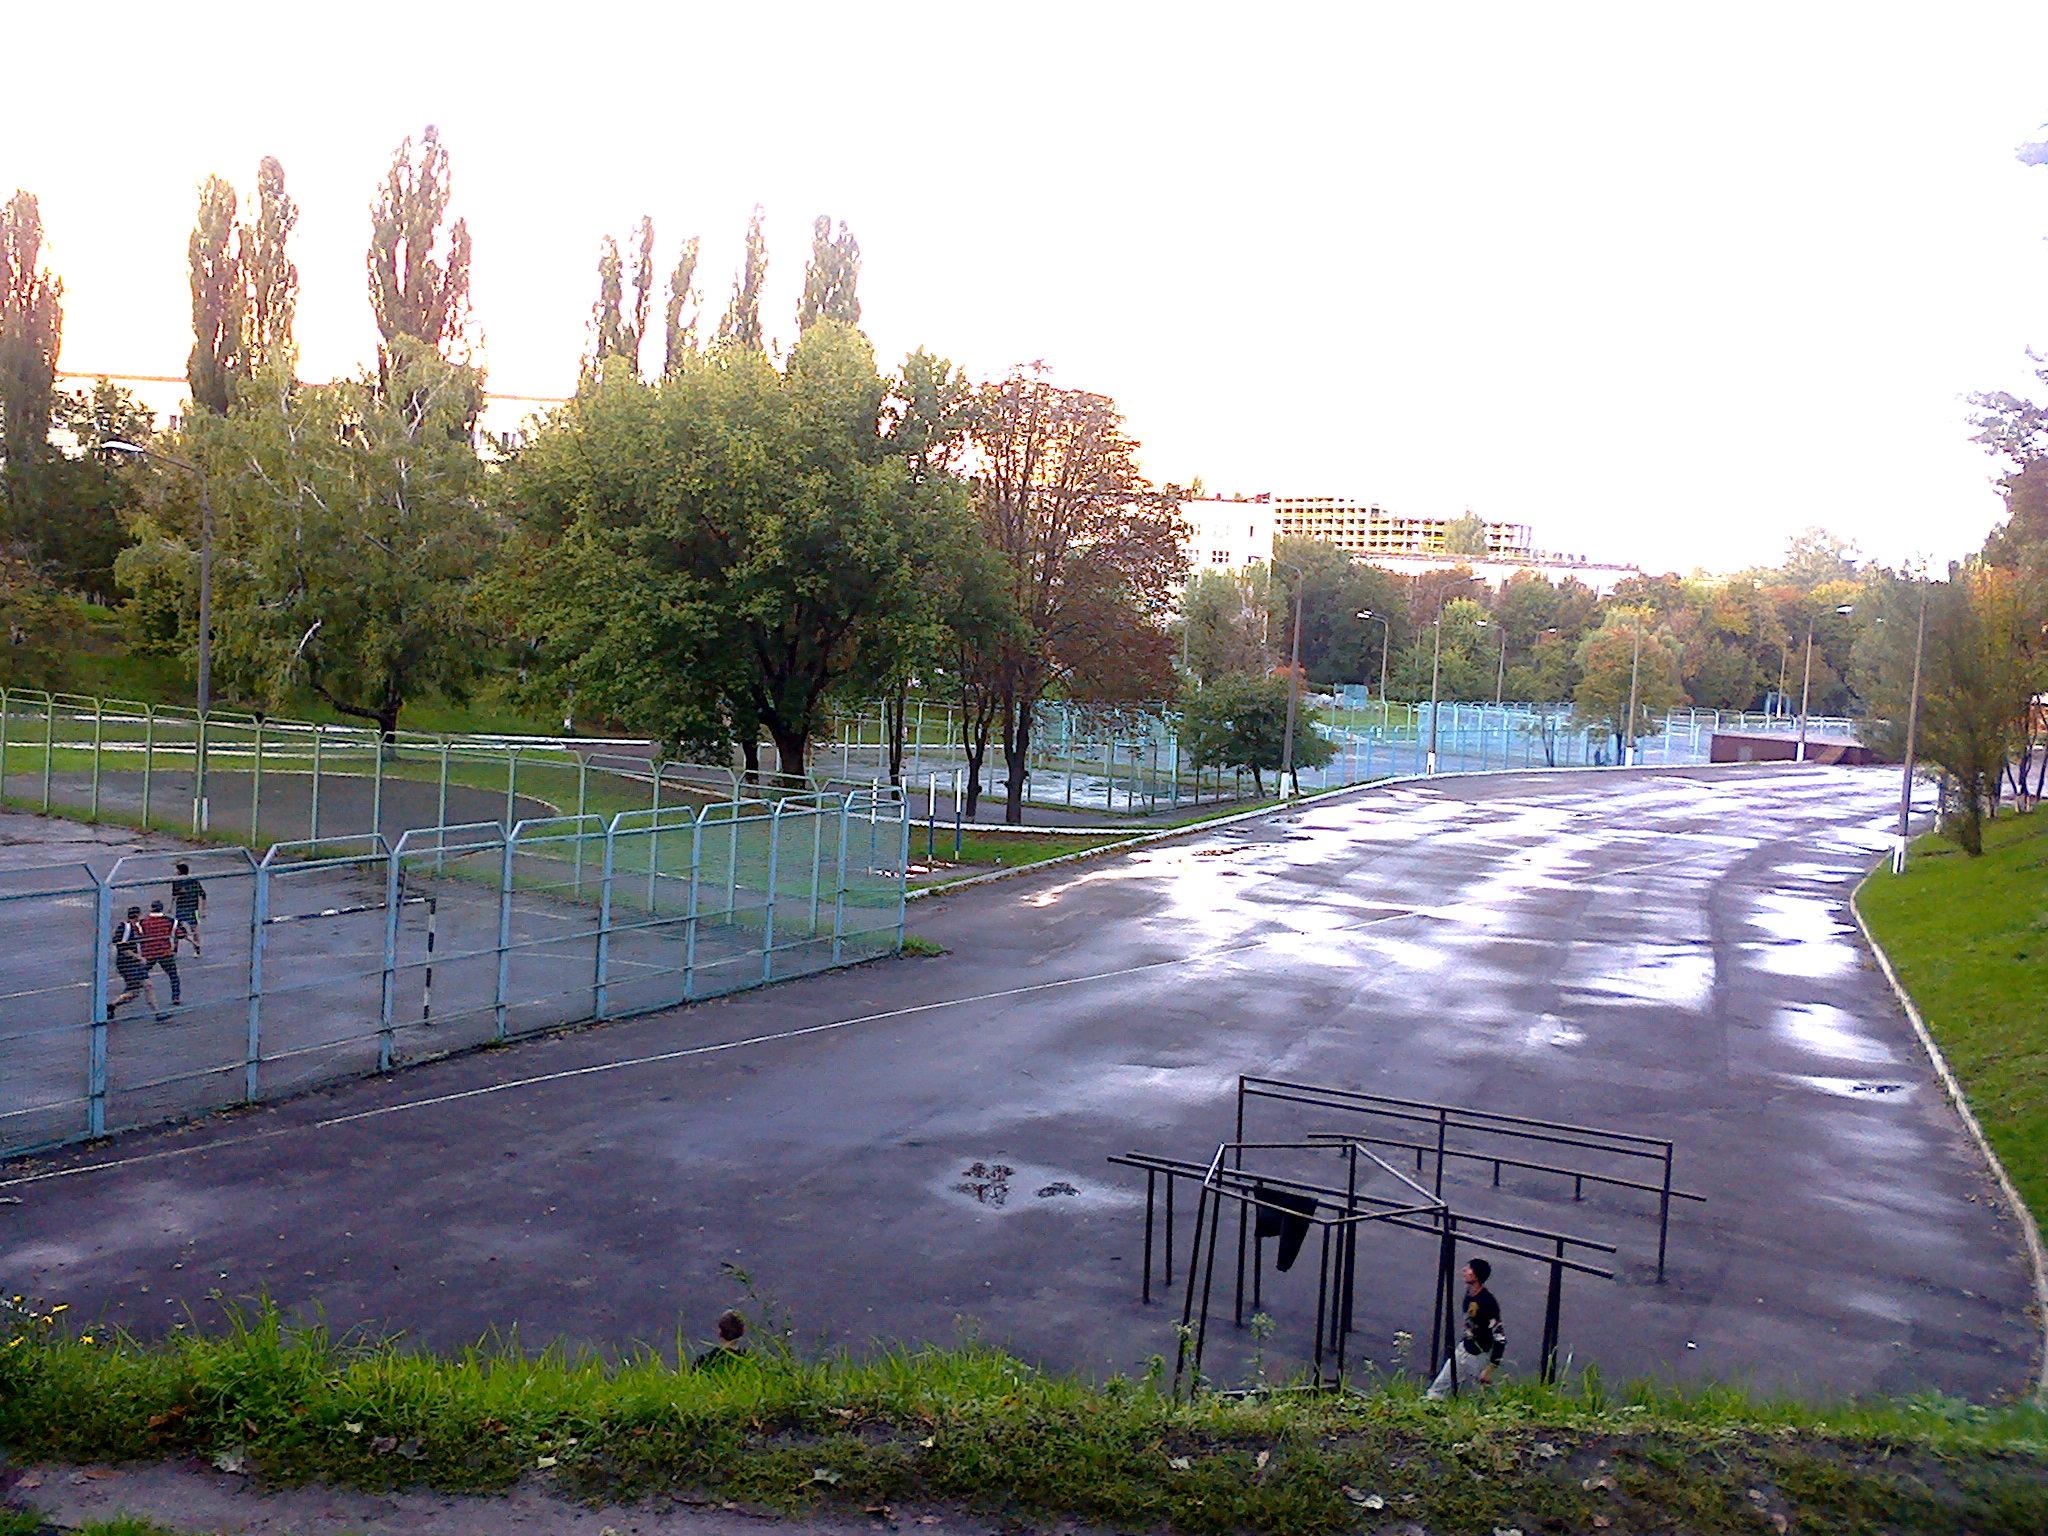 20130929-005